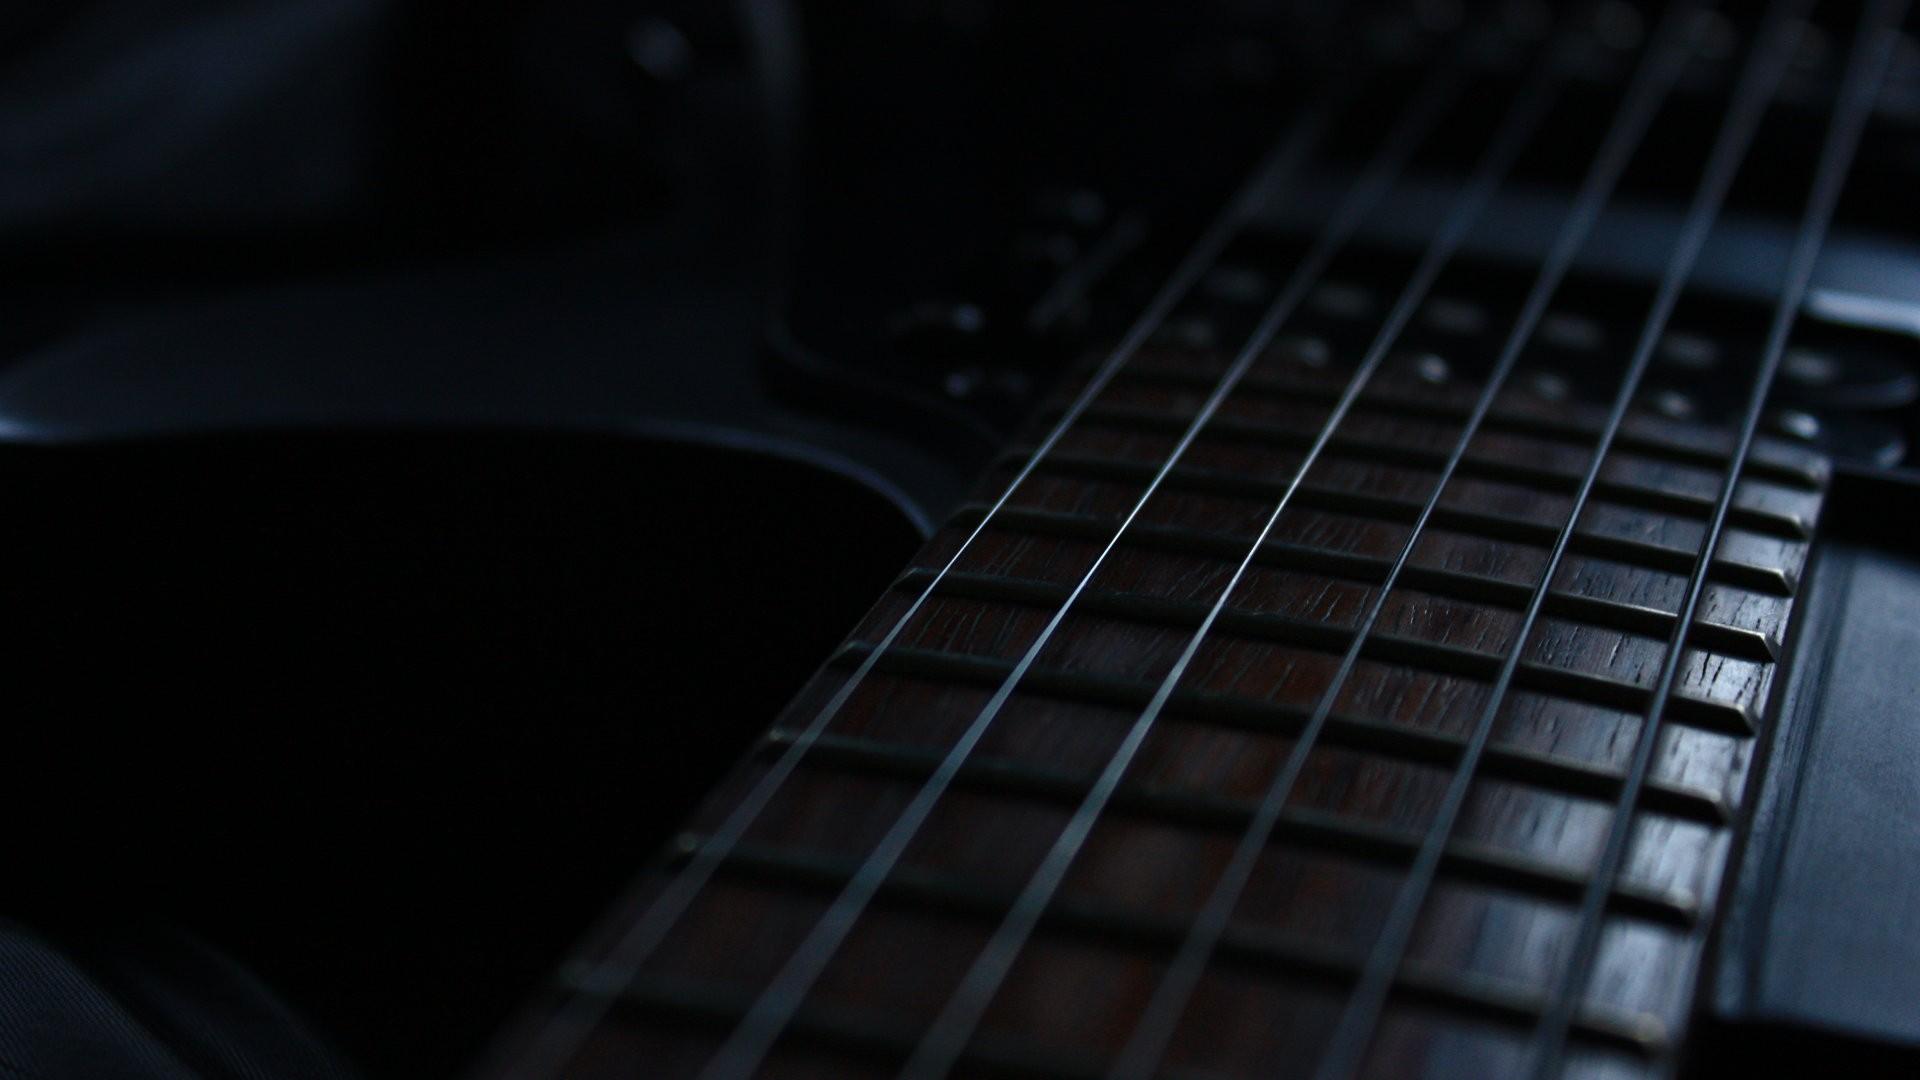 Guitare Fond D'écran Iphone HD